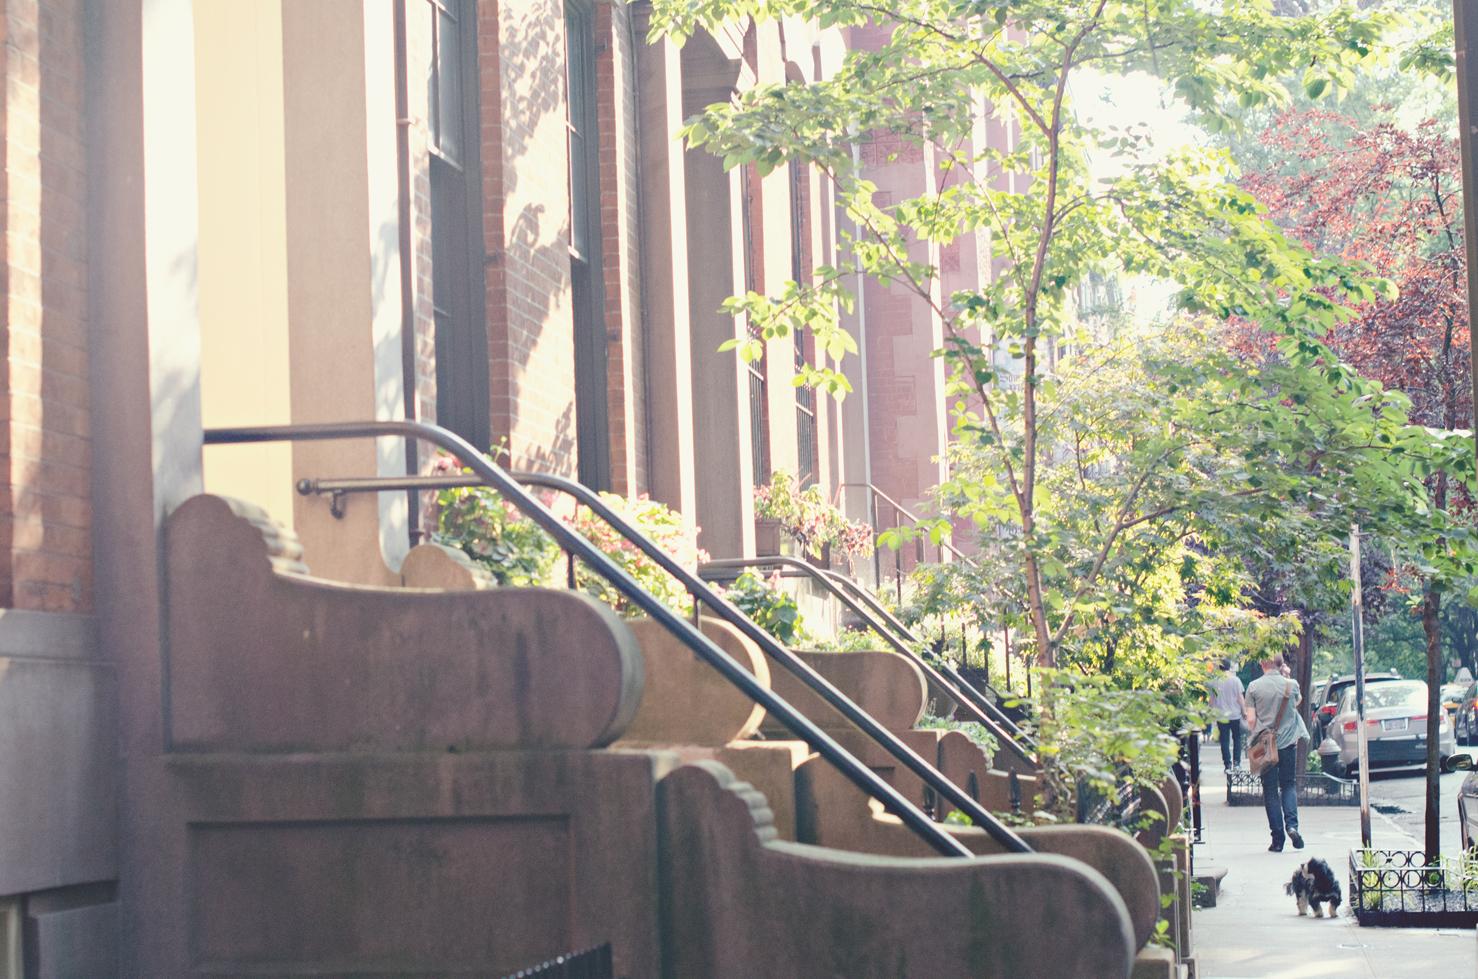 nyc20120621_0412.jpg